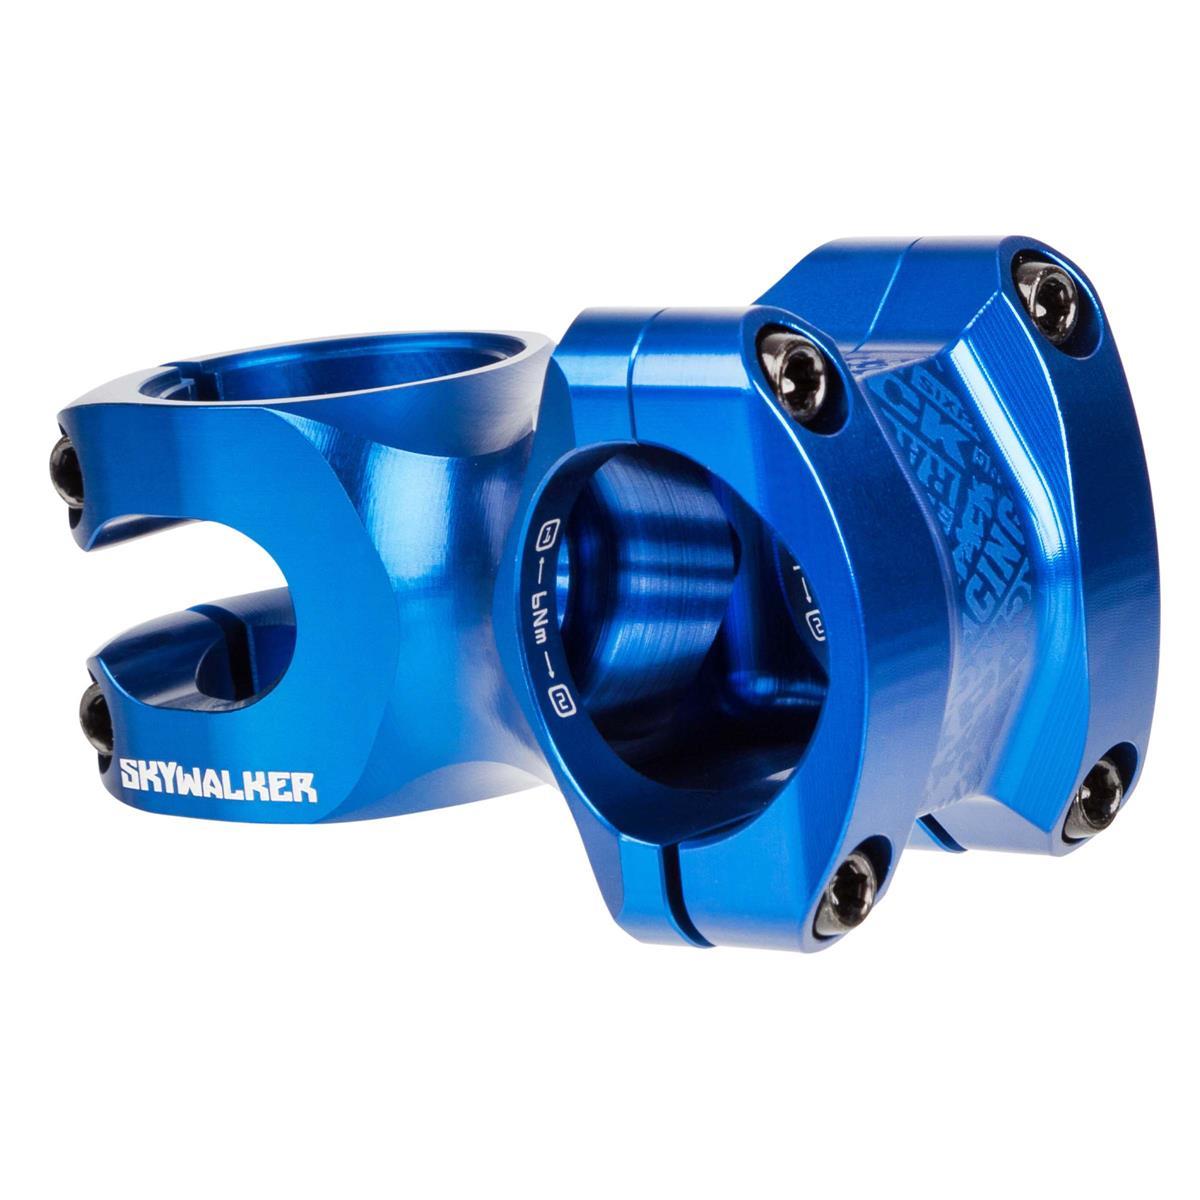 Sixpack MTB-Vorbau Skywalker Blau, 31.8 mm, Vorlauf 50 mm